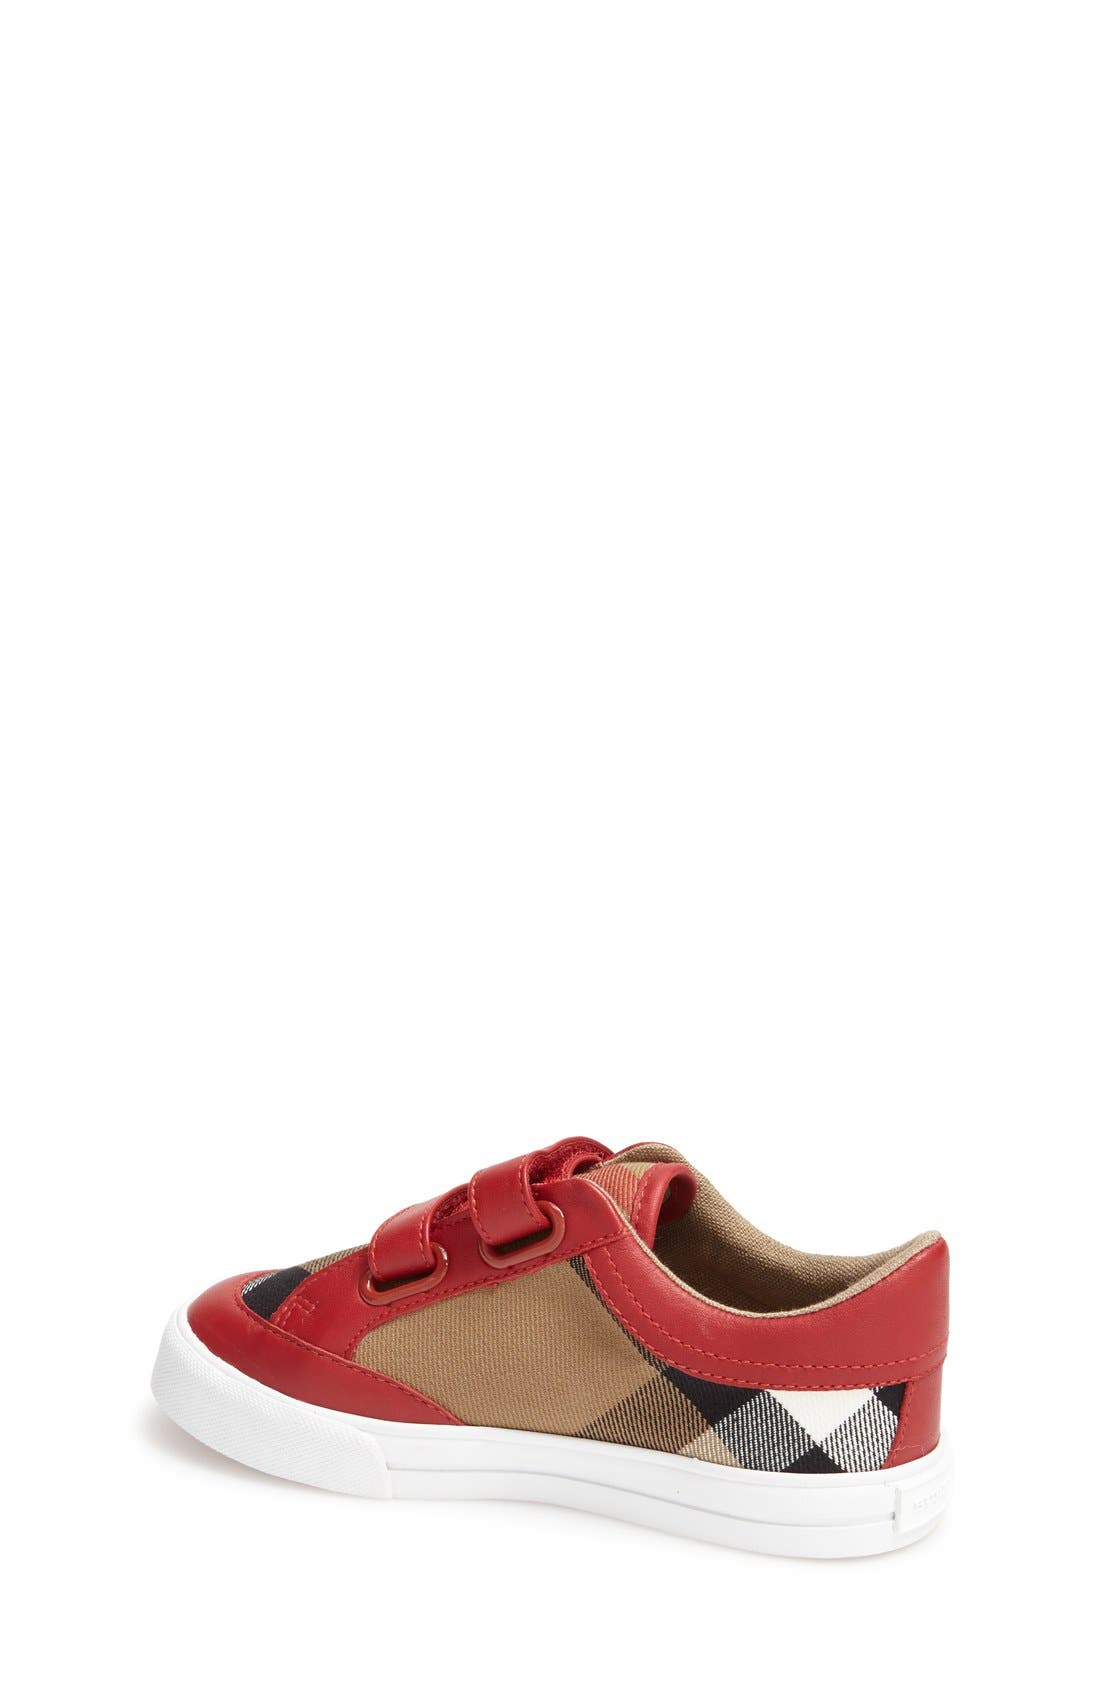 Mini Heacham Sneaker,                             Alternate thumbnail 2, color,                             Parade Red